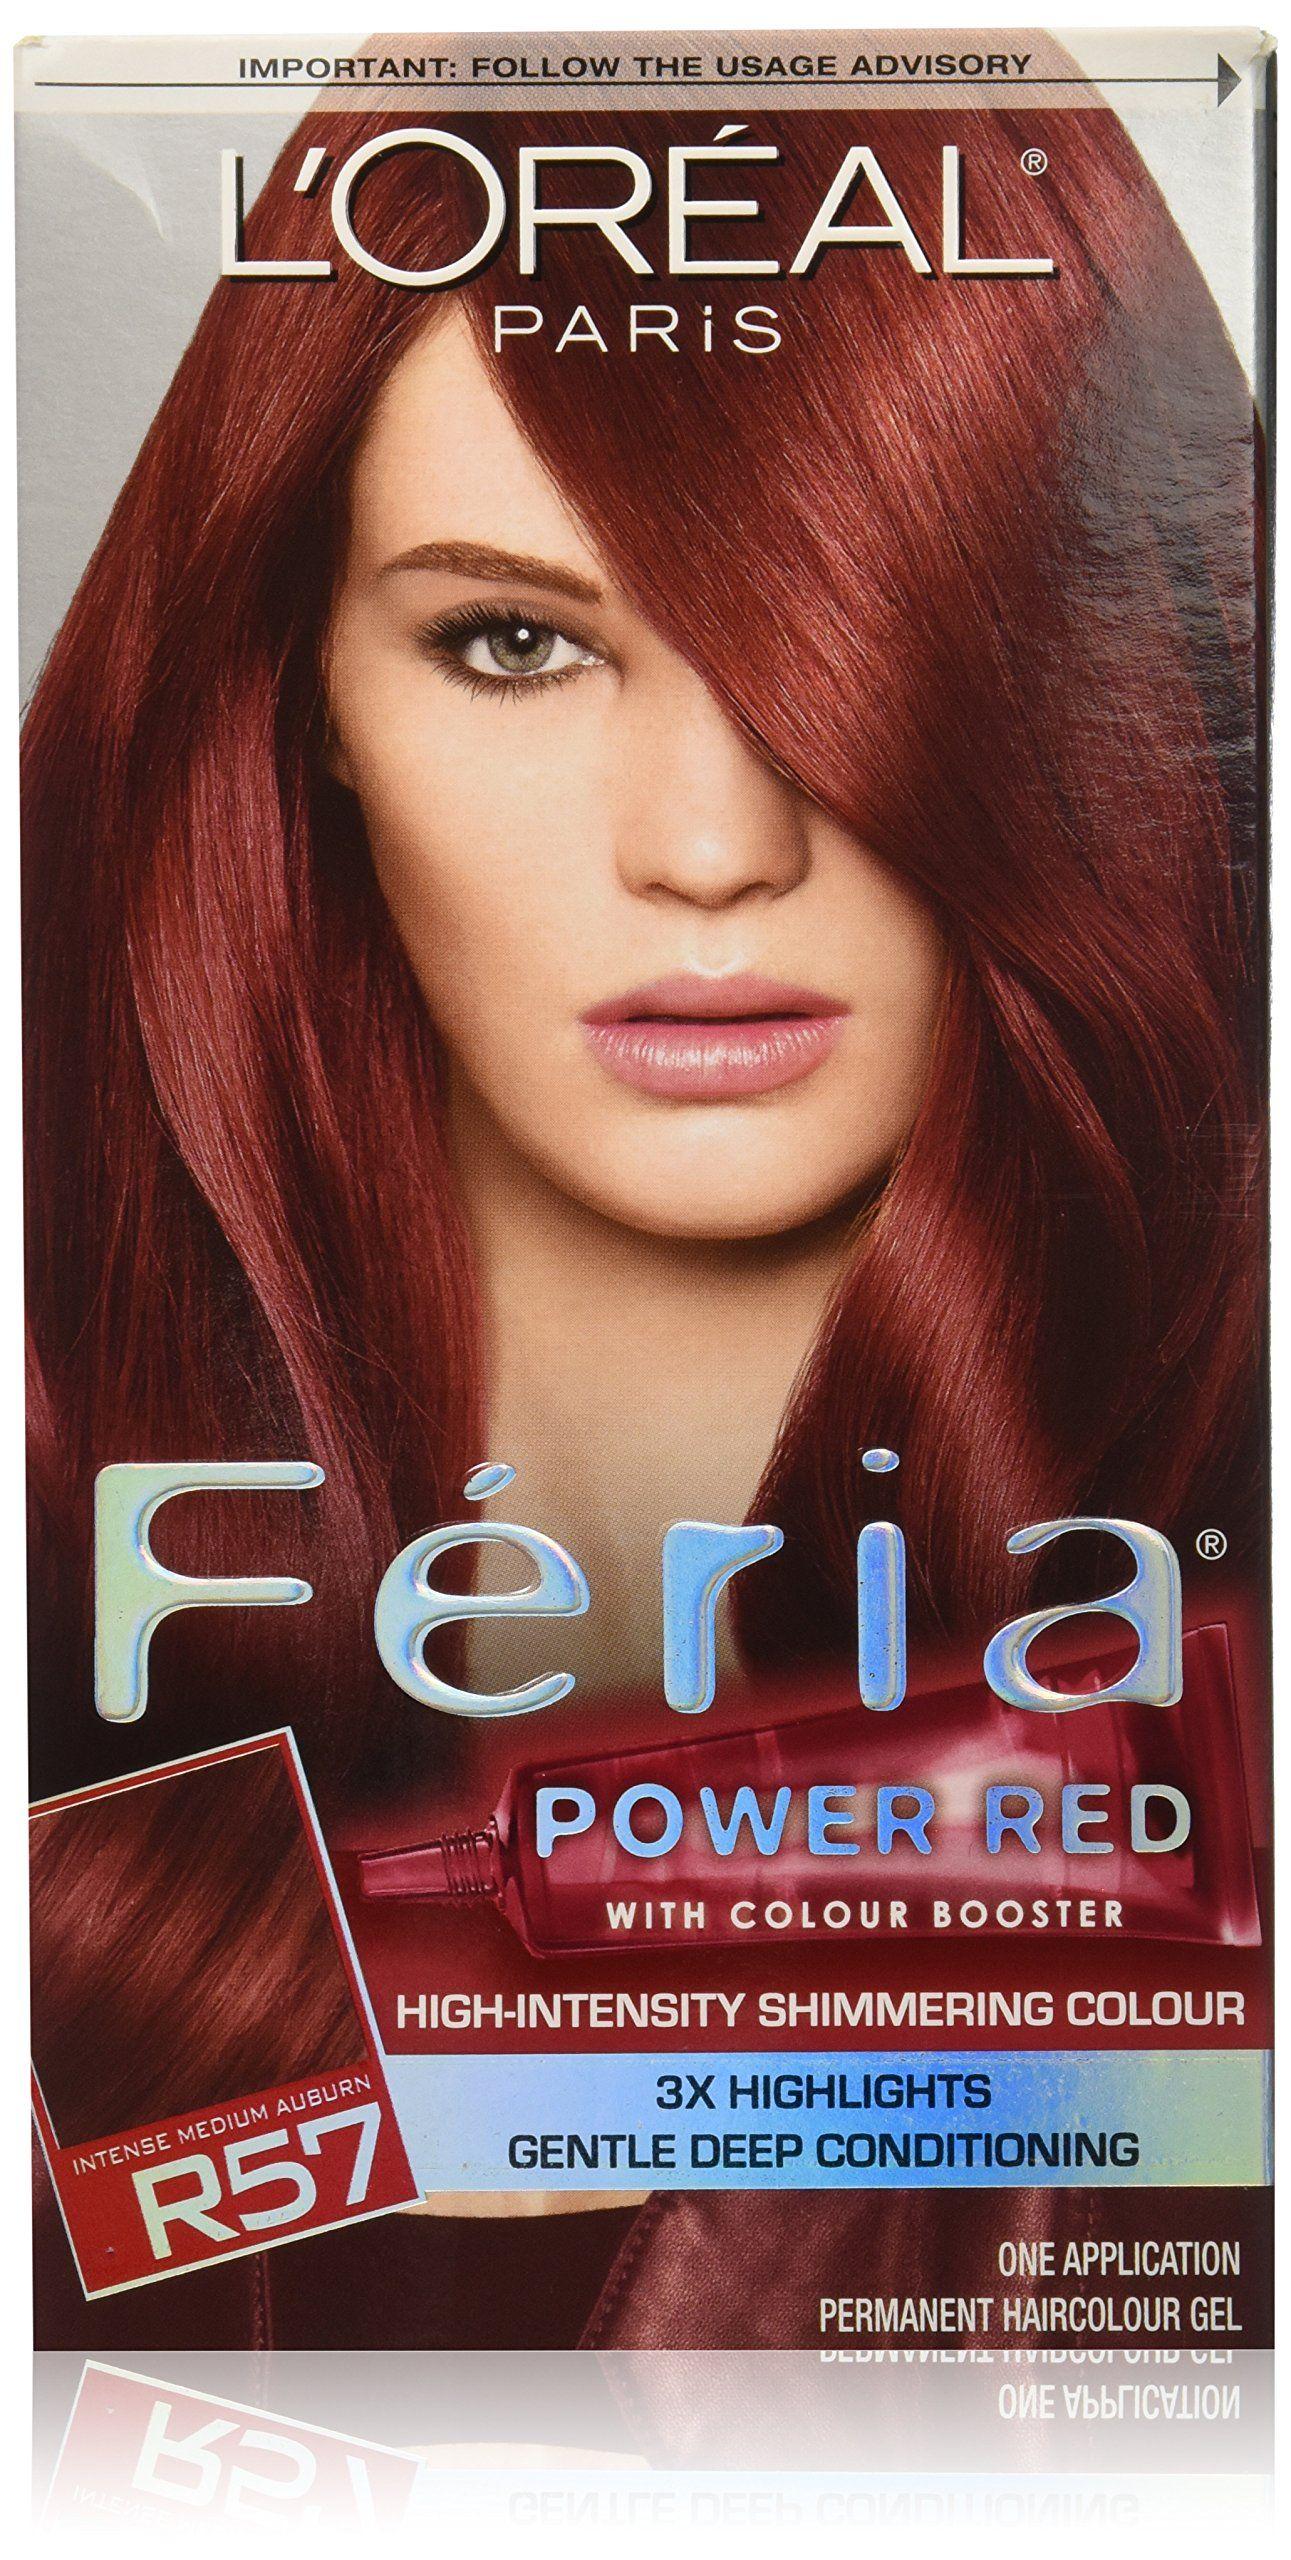 Loreal Feria Power Reds Hair Color R57 Intense Medium Auburn